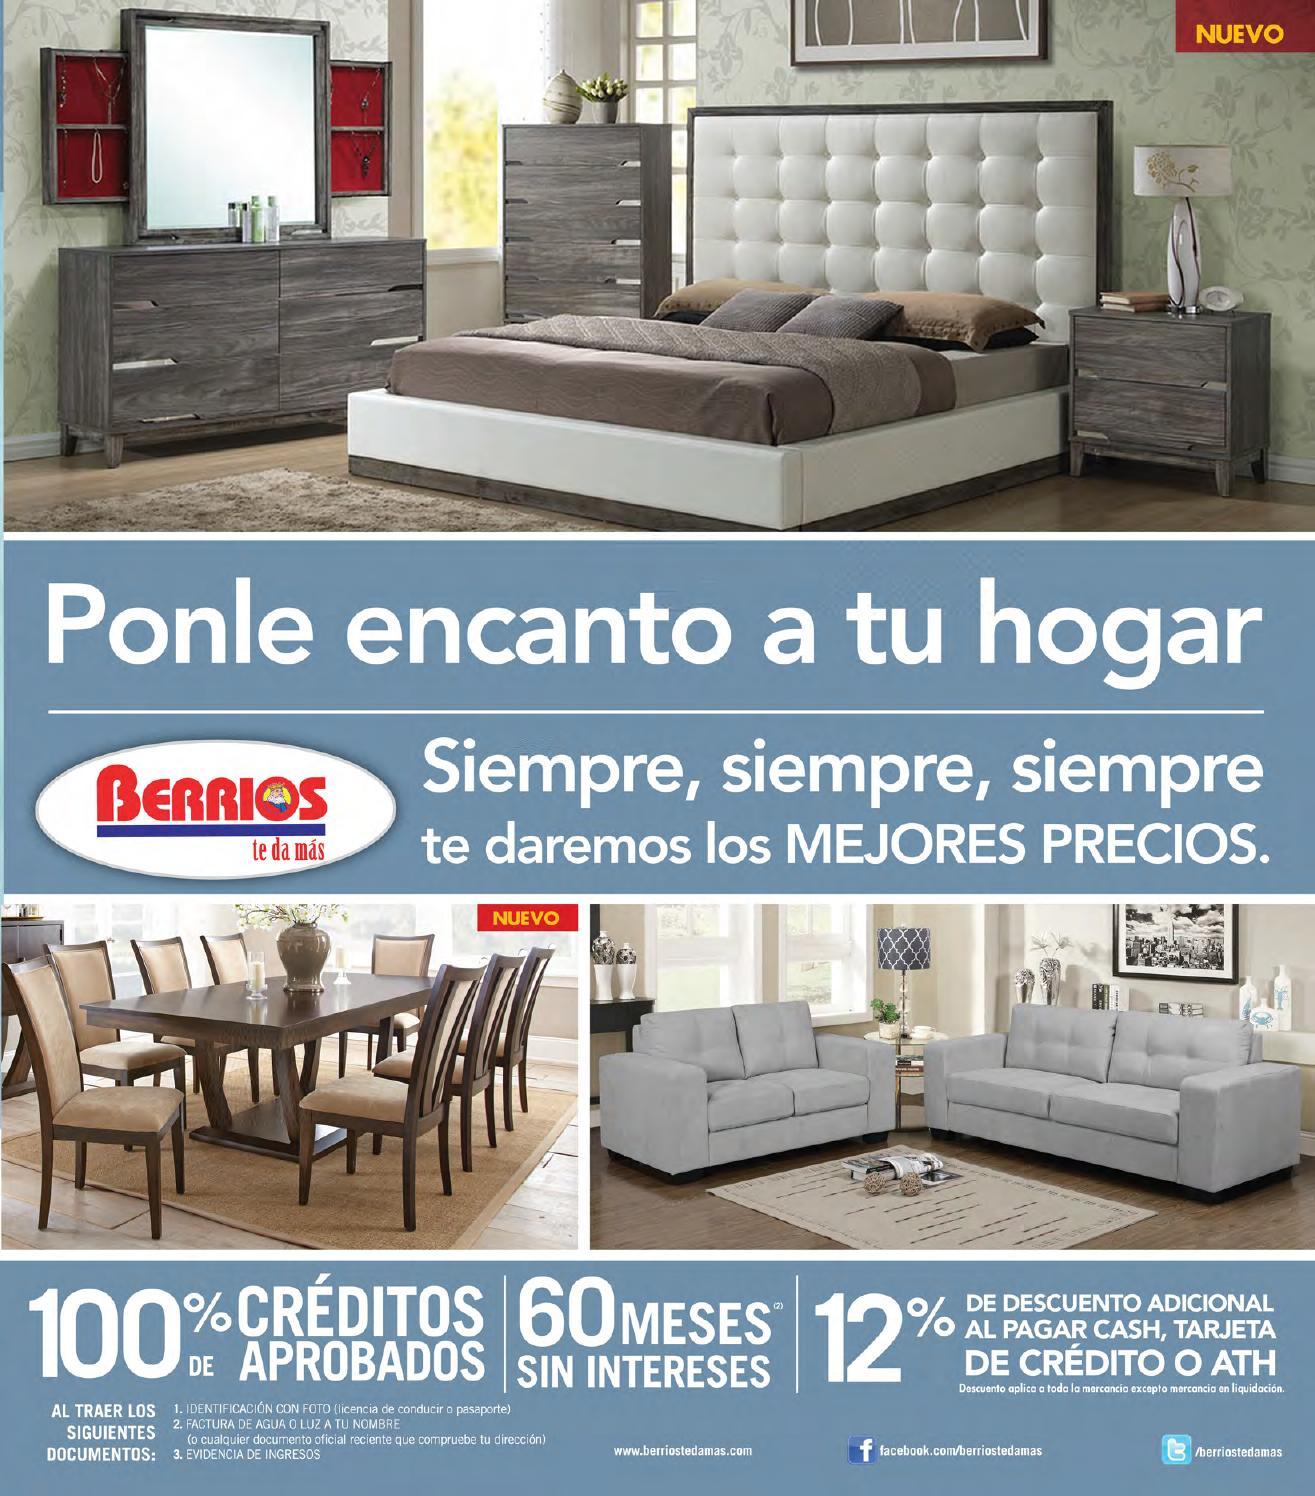 Mueblerias Berrios Shopper | Ponle Encanto A Tu Hogar By Berrios   Issuu